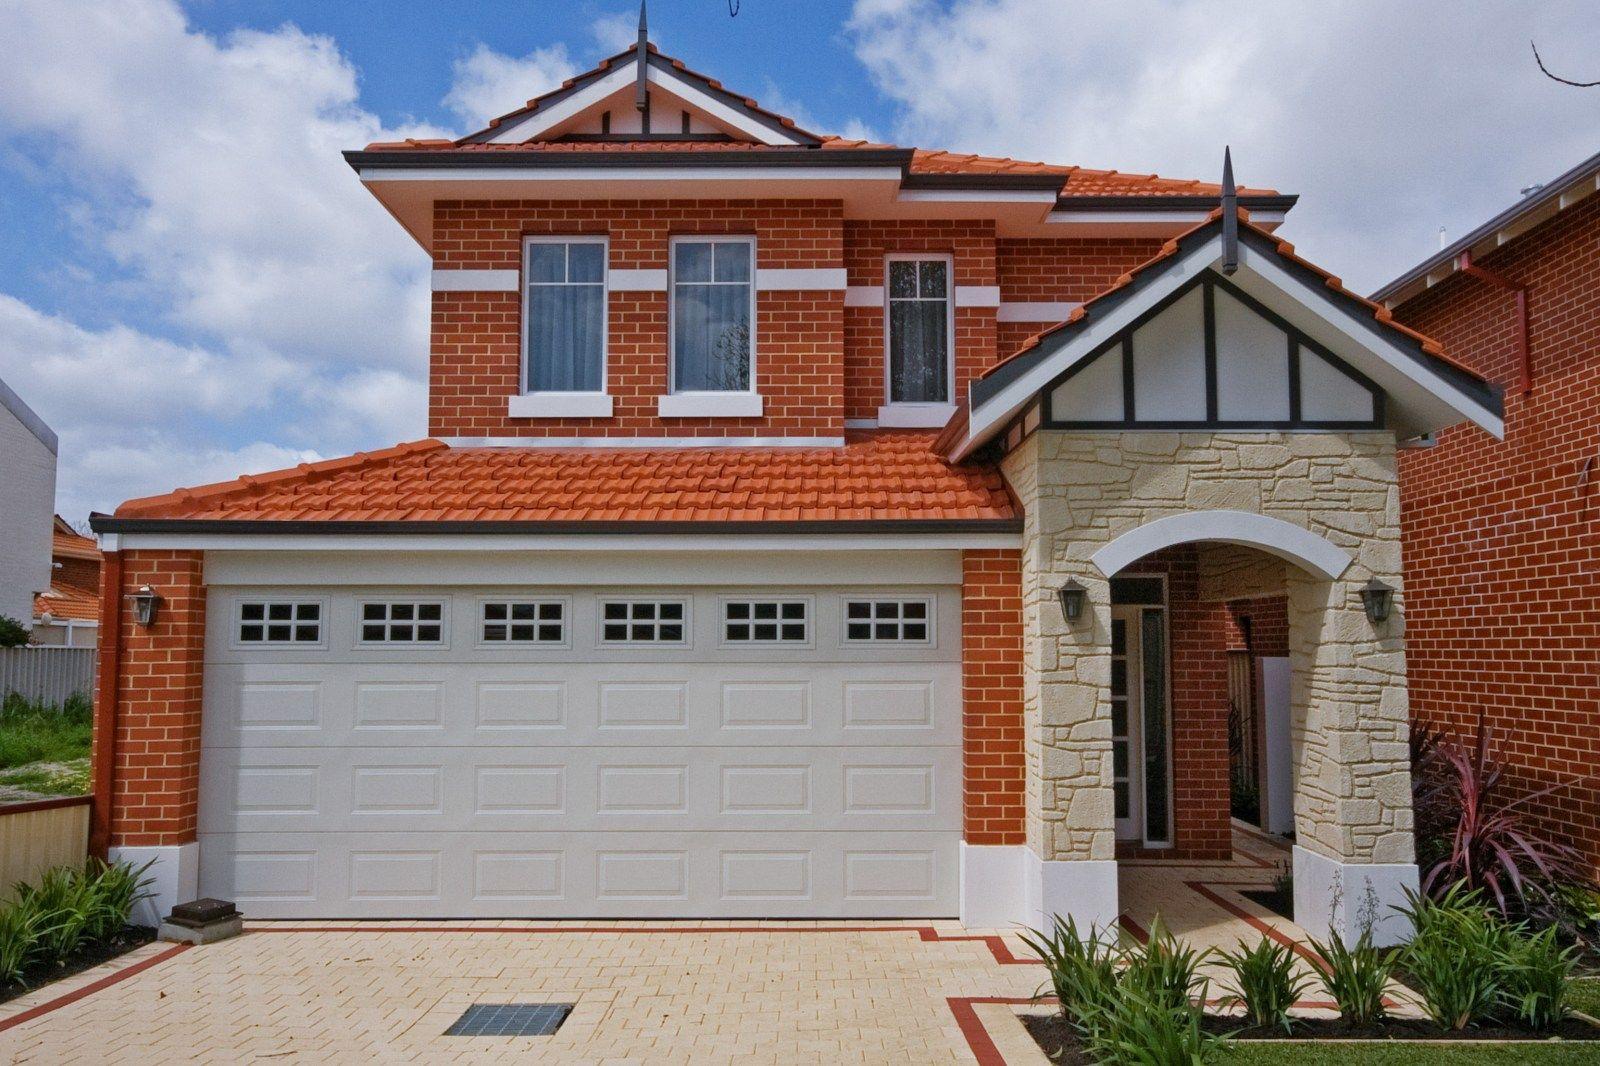 The Brisbane By Plunkett Homes